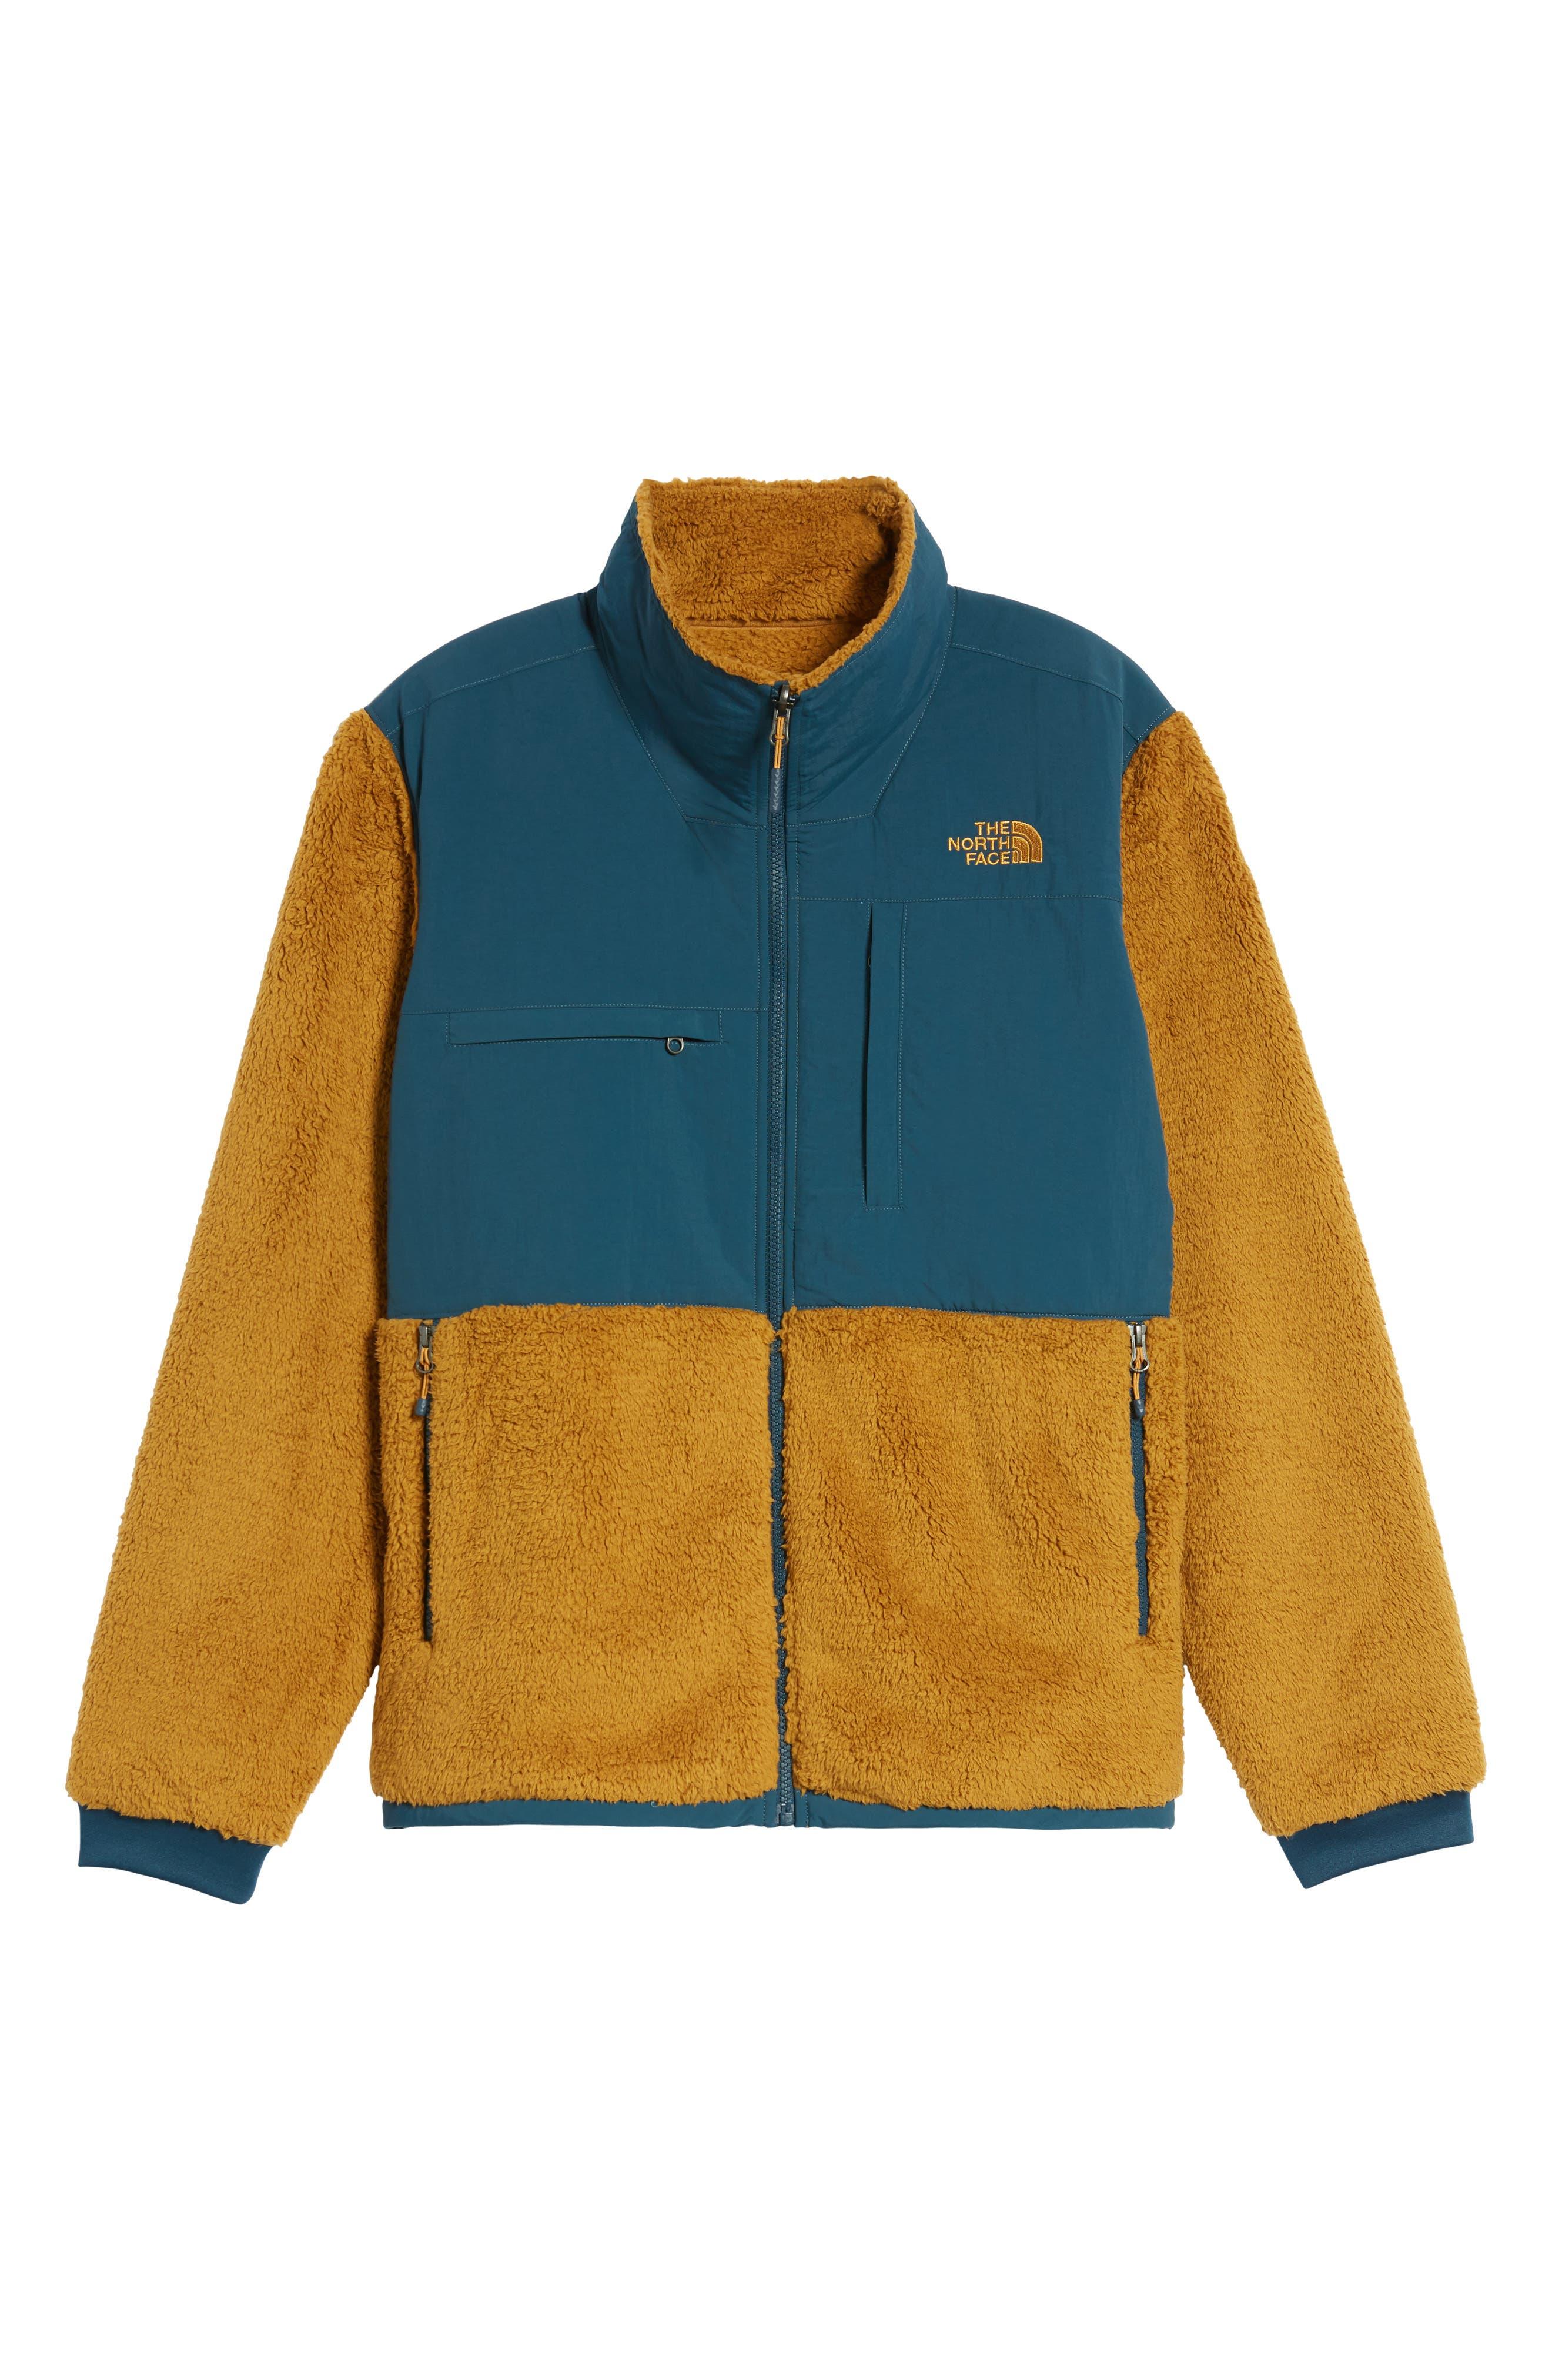 Novelty Denali Jacket,                             Alternate thumbnail 5, color,                             211